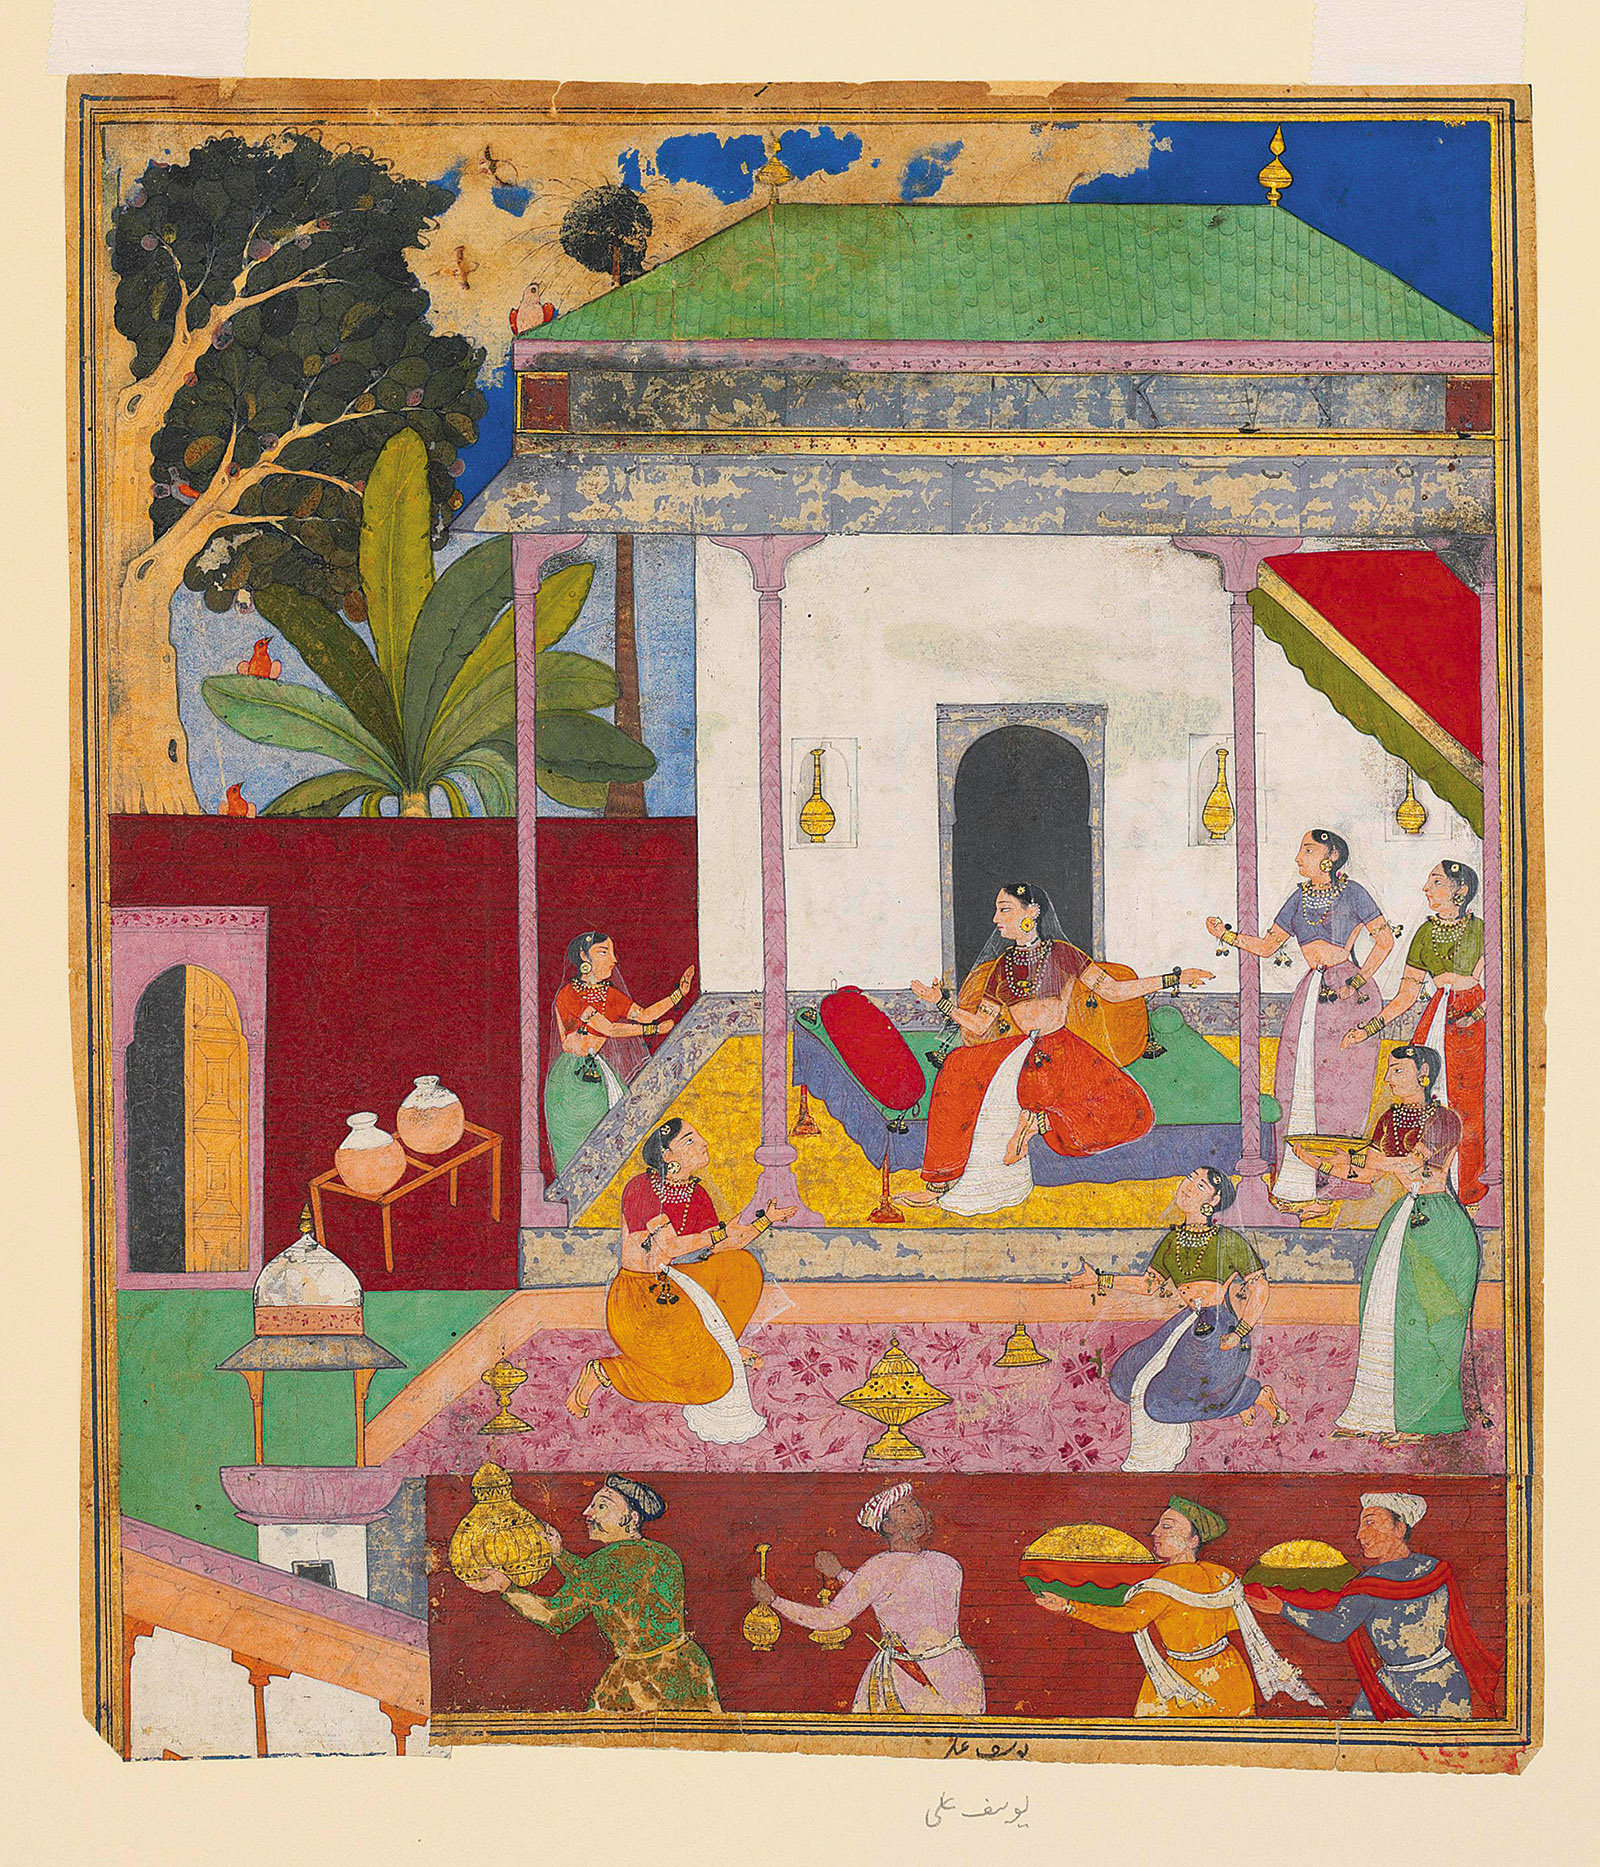 'Draupadi and Her Attendants'; illustration by Yusuf Ali from the Razmnama, a Persian translation of the Mahabharata, 1616–1617